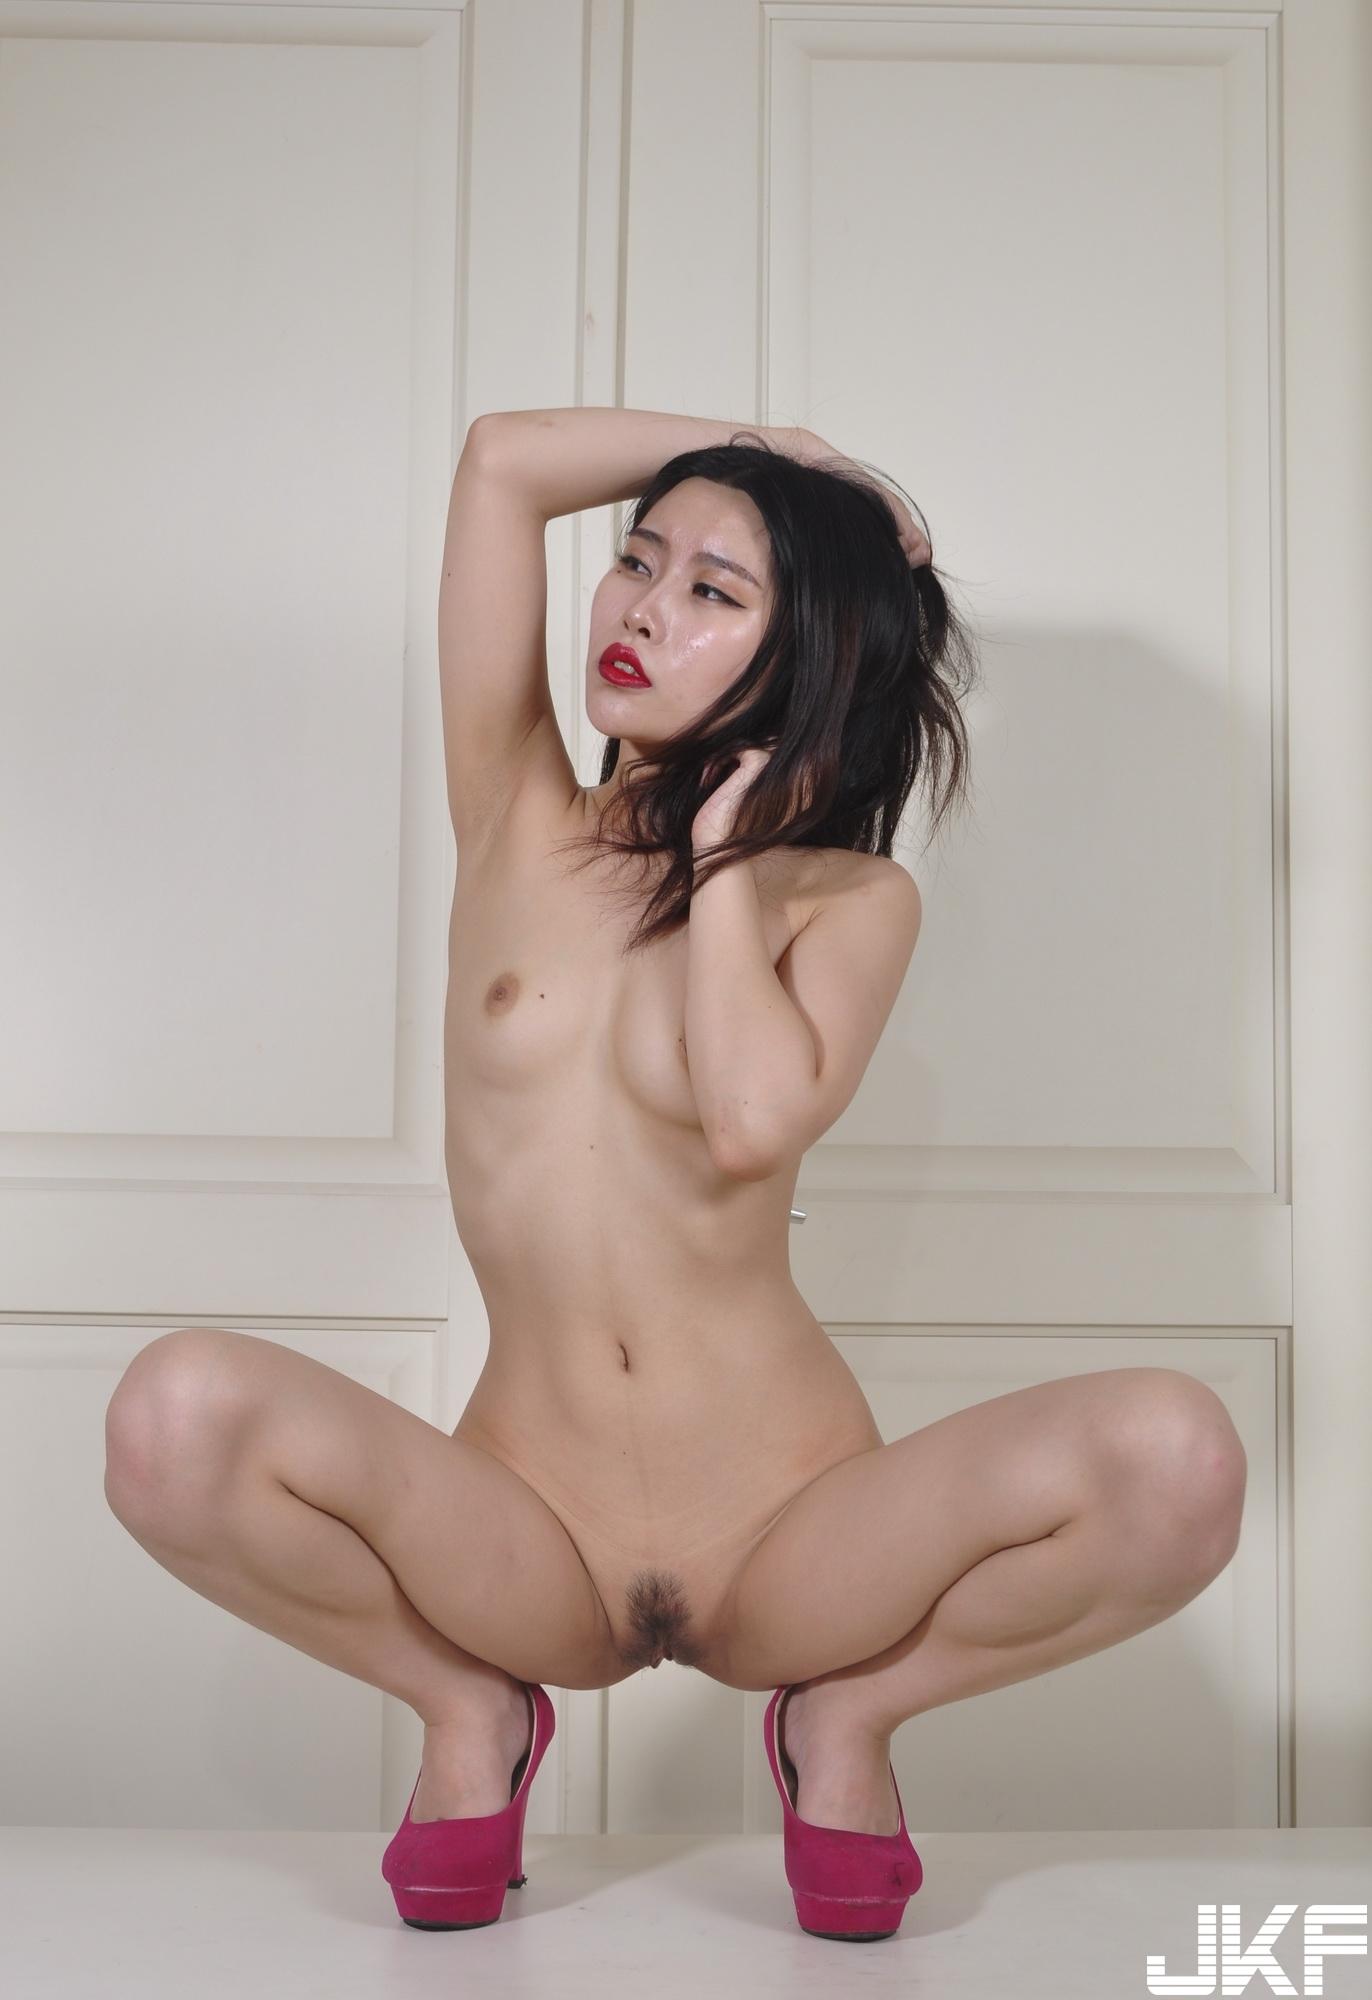 A_114.jpg